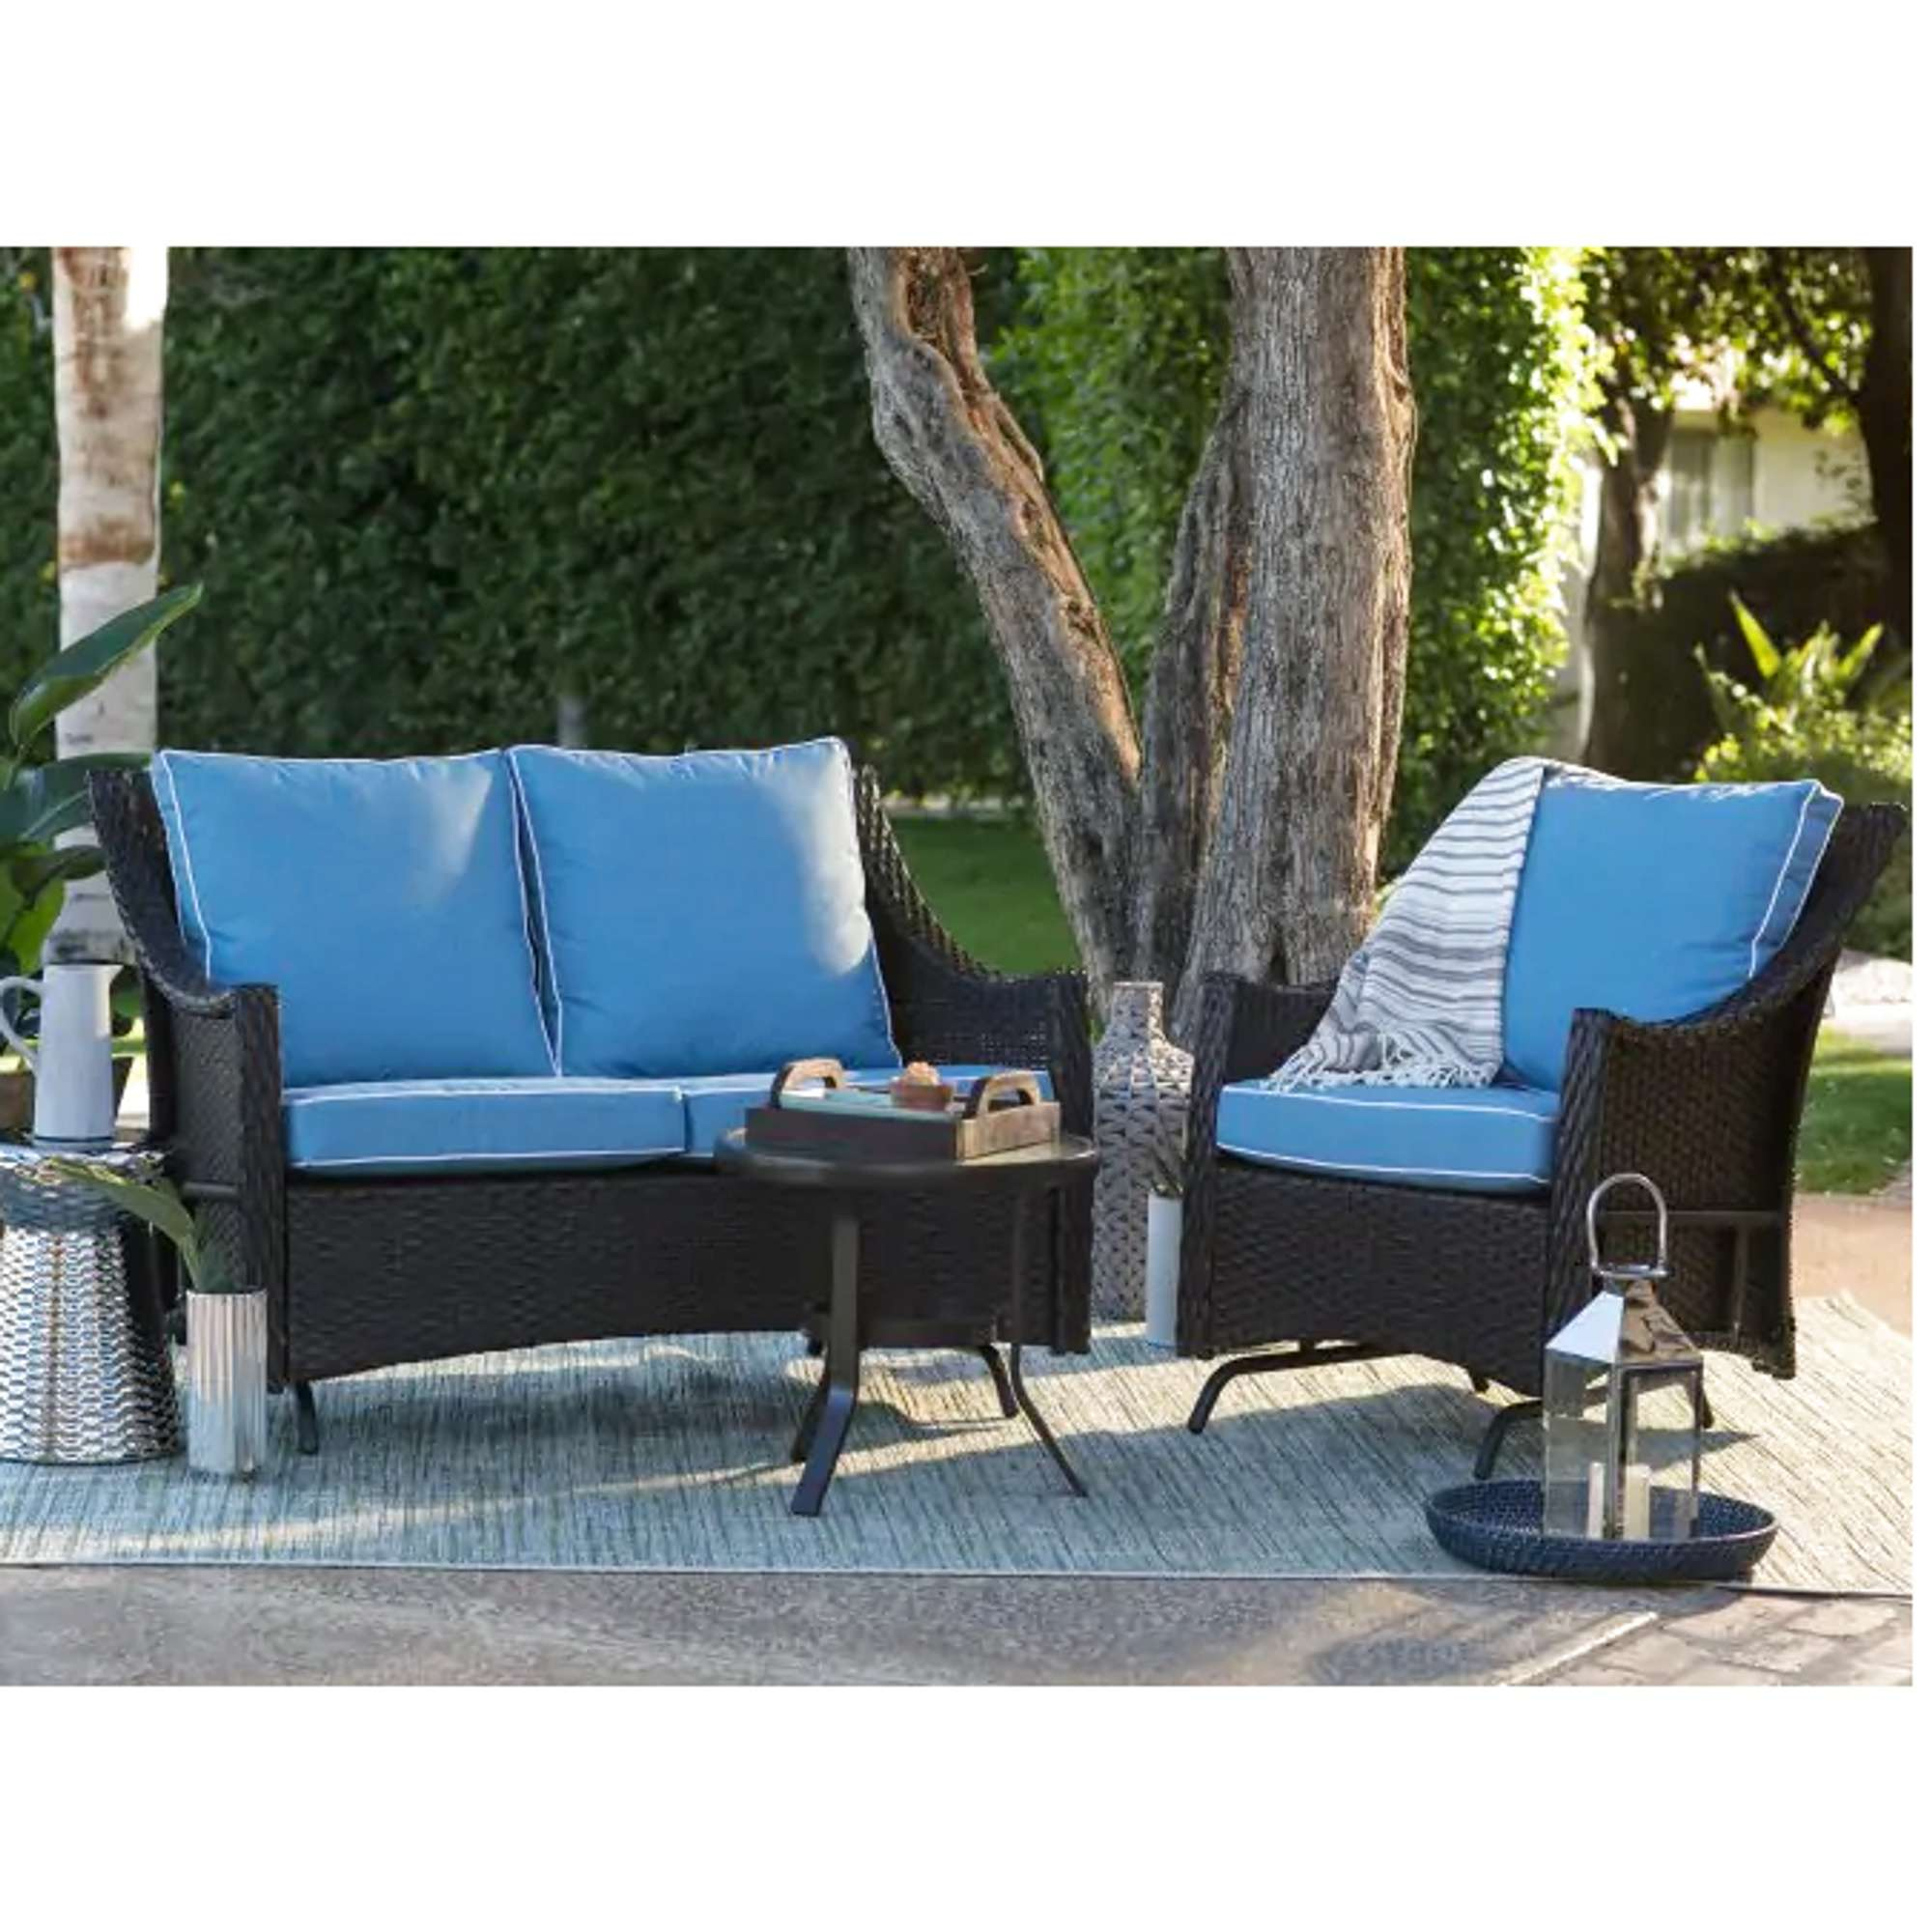 Resin Wicker Loveseat Glider W Cushion Loveseat Online Auctions Los Angeles